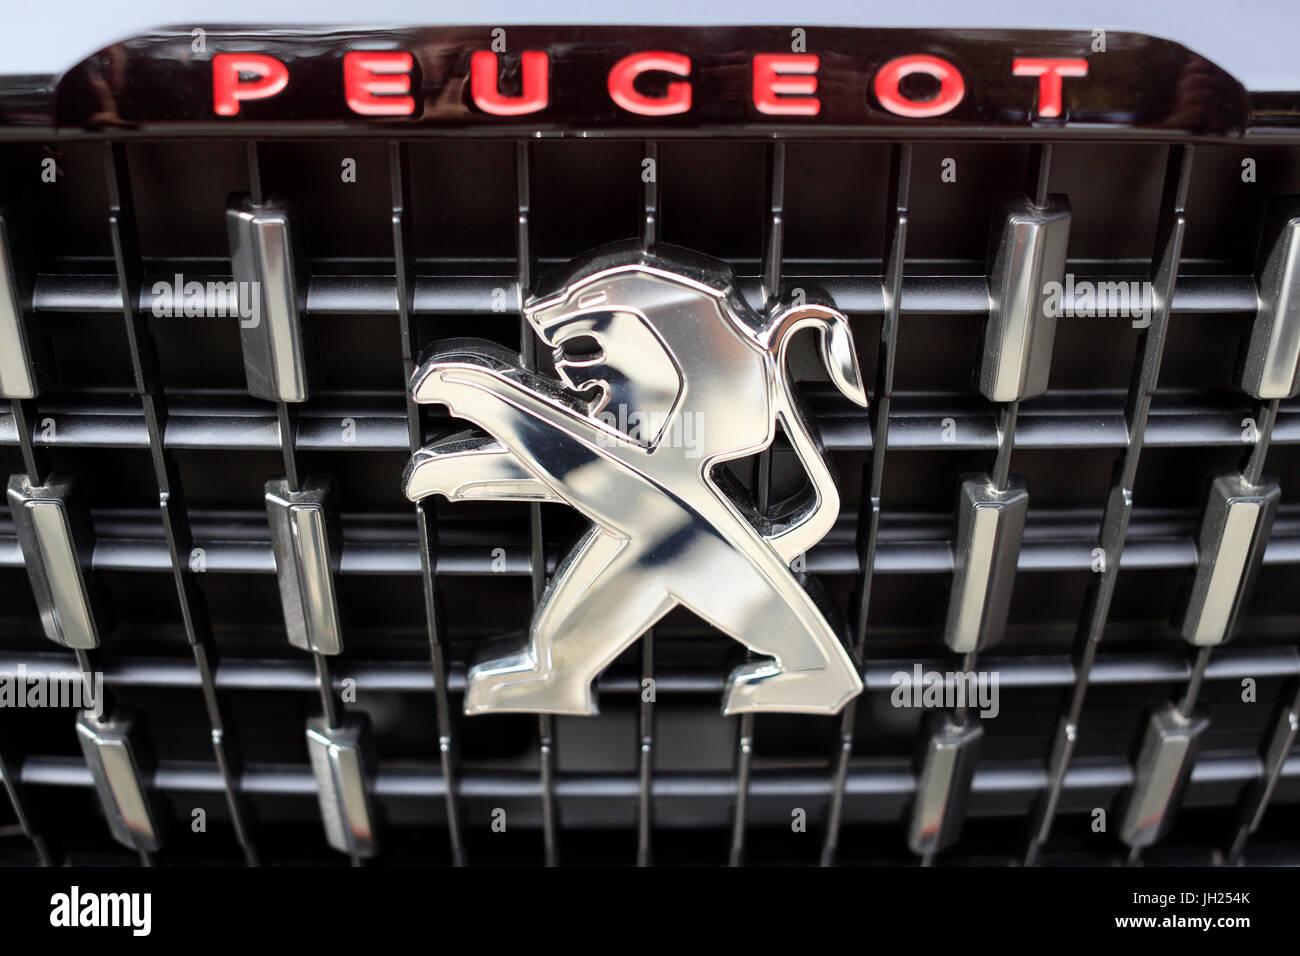 Lion on a Peugeot car. France. - Stock Image